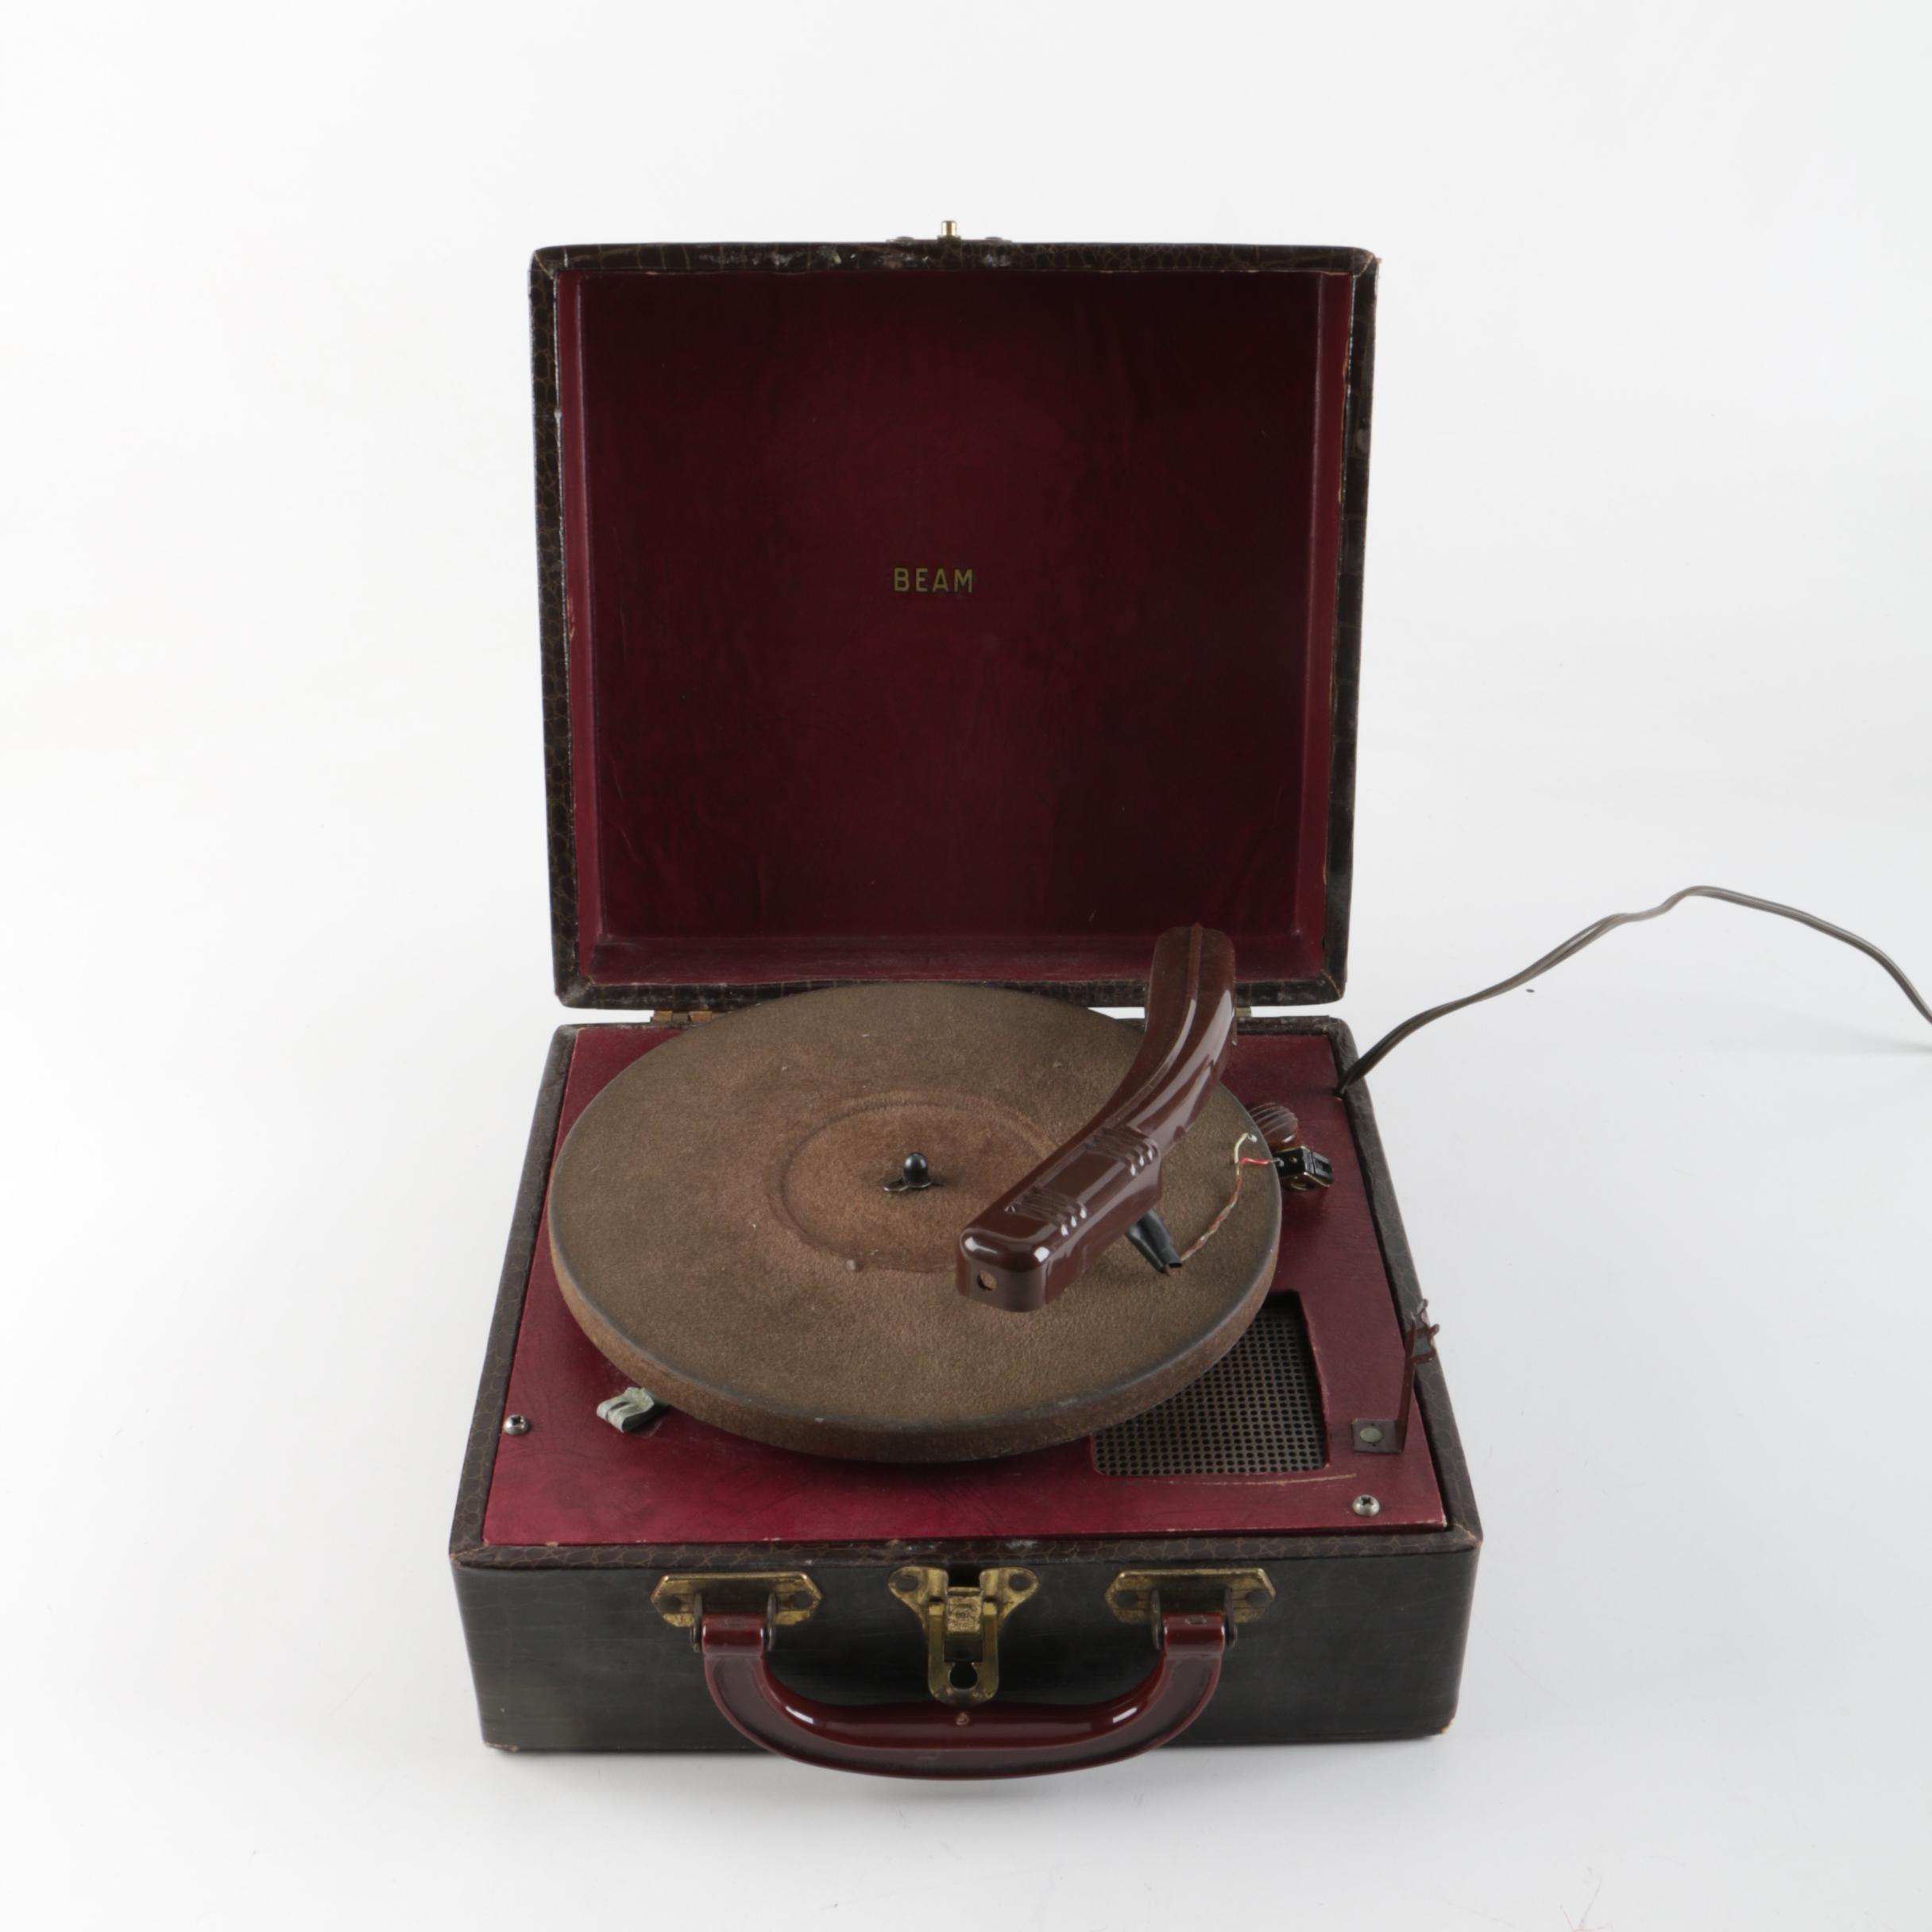 Beam Portable Record Player